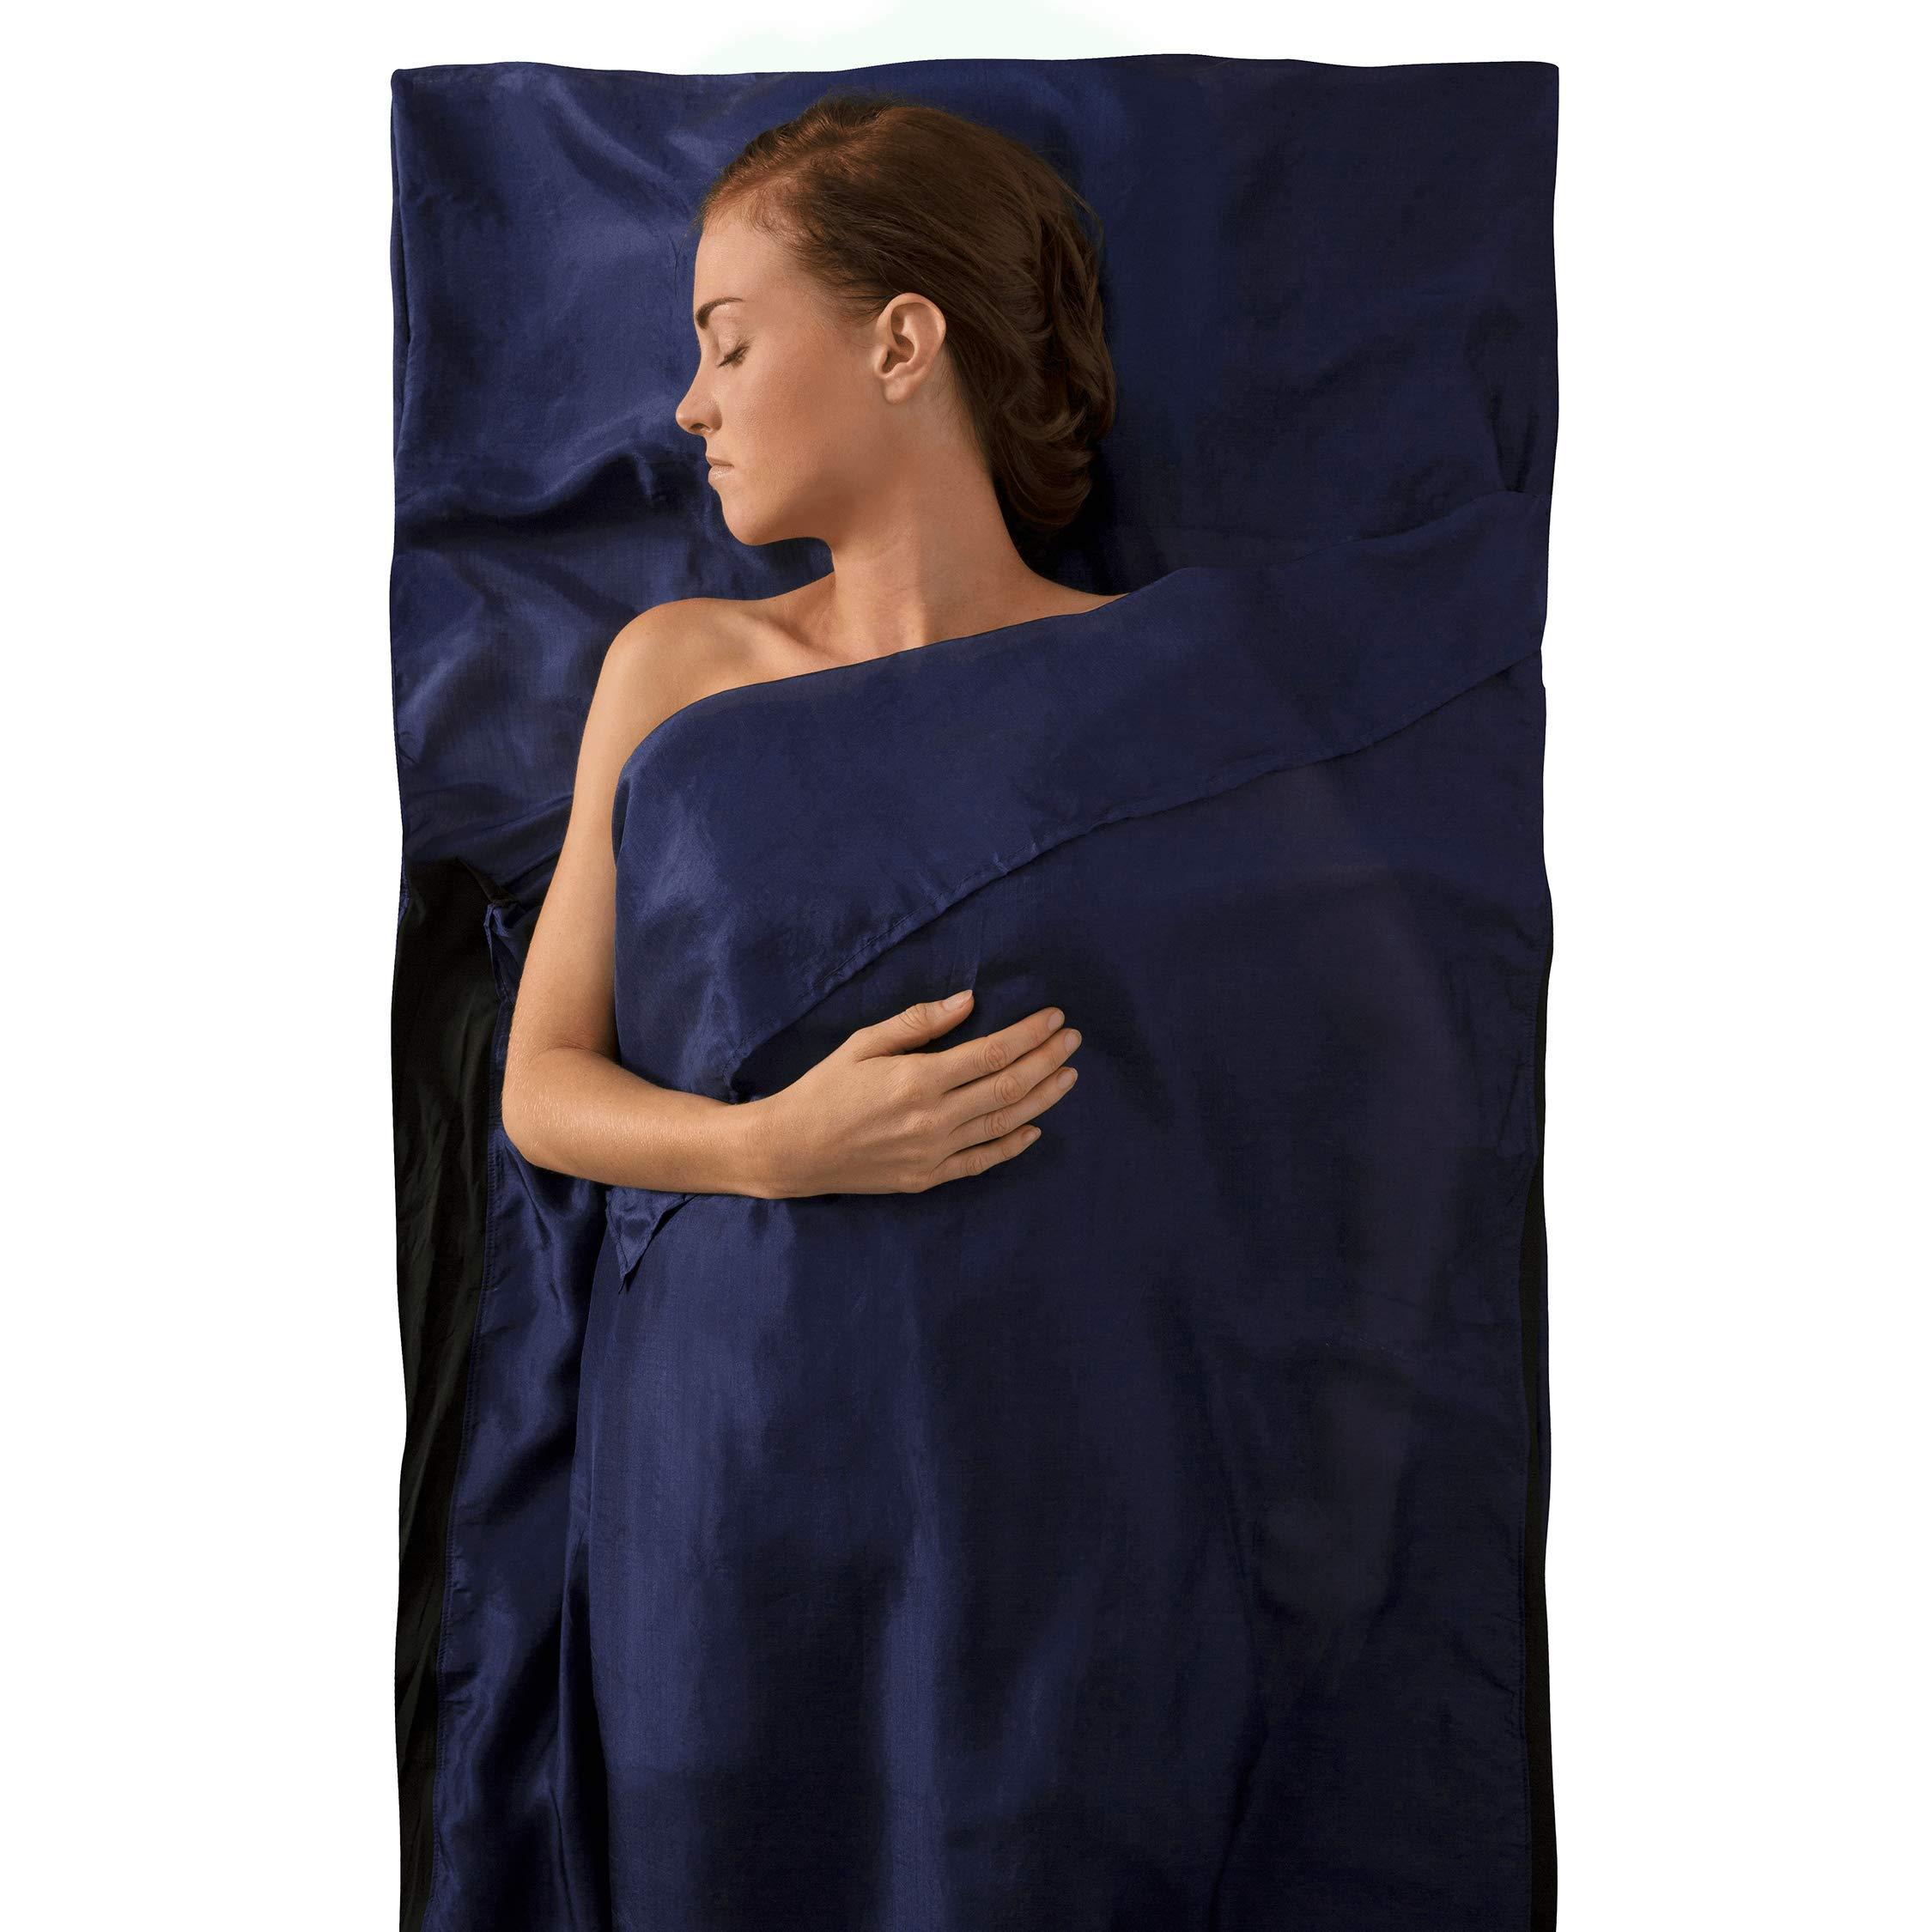 Sea to Summit Premium Silk Travel Liner, Traveller w/Pillow Insert (85 x 36in) (Navy Blue) by Sea to Summit